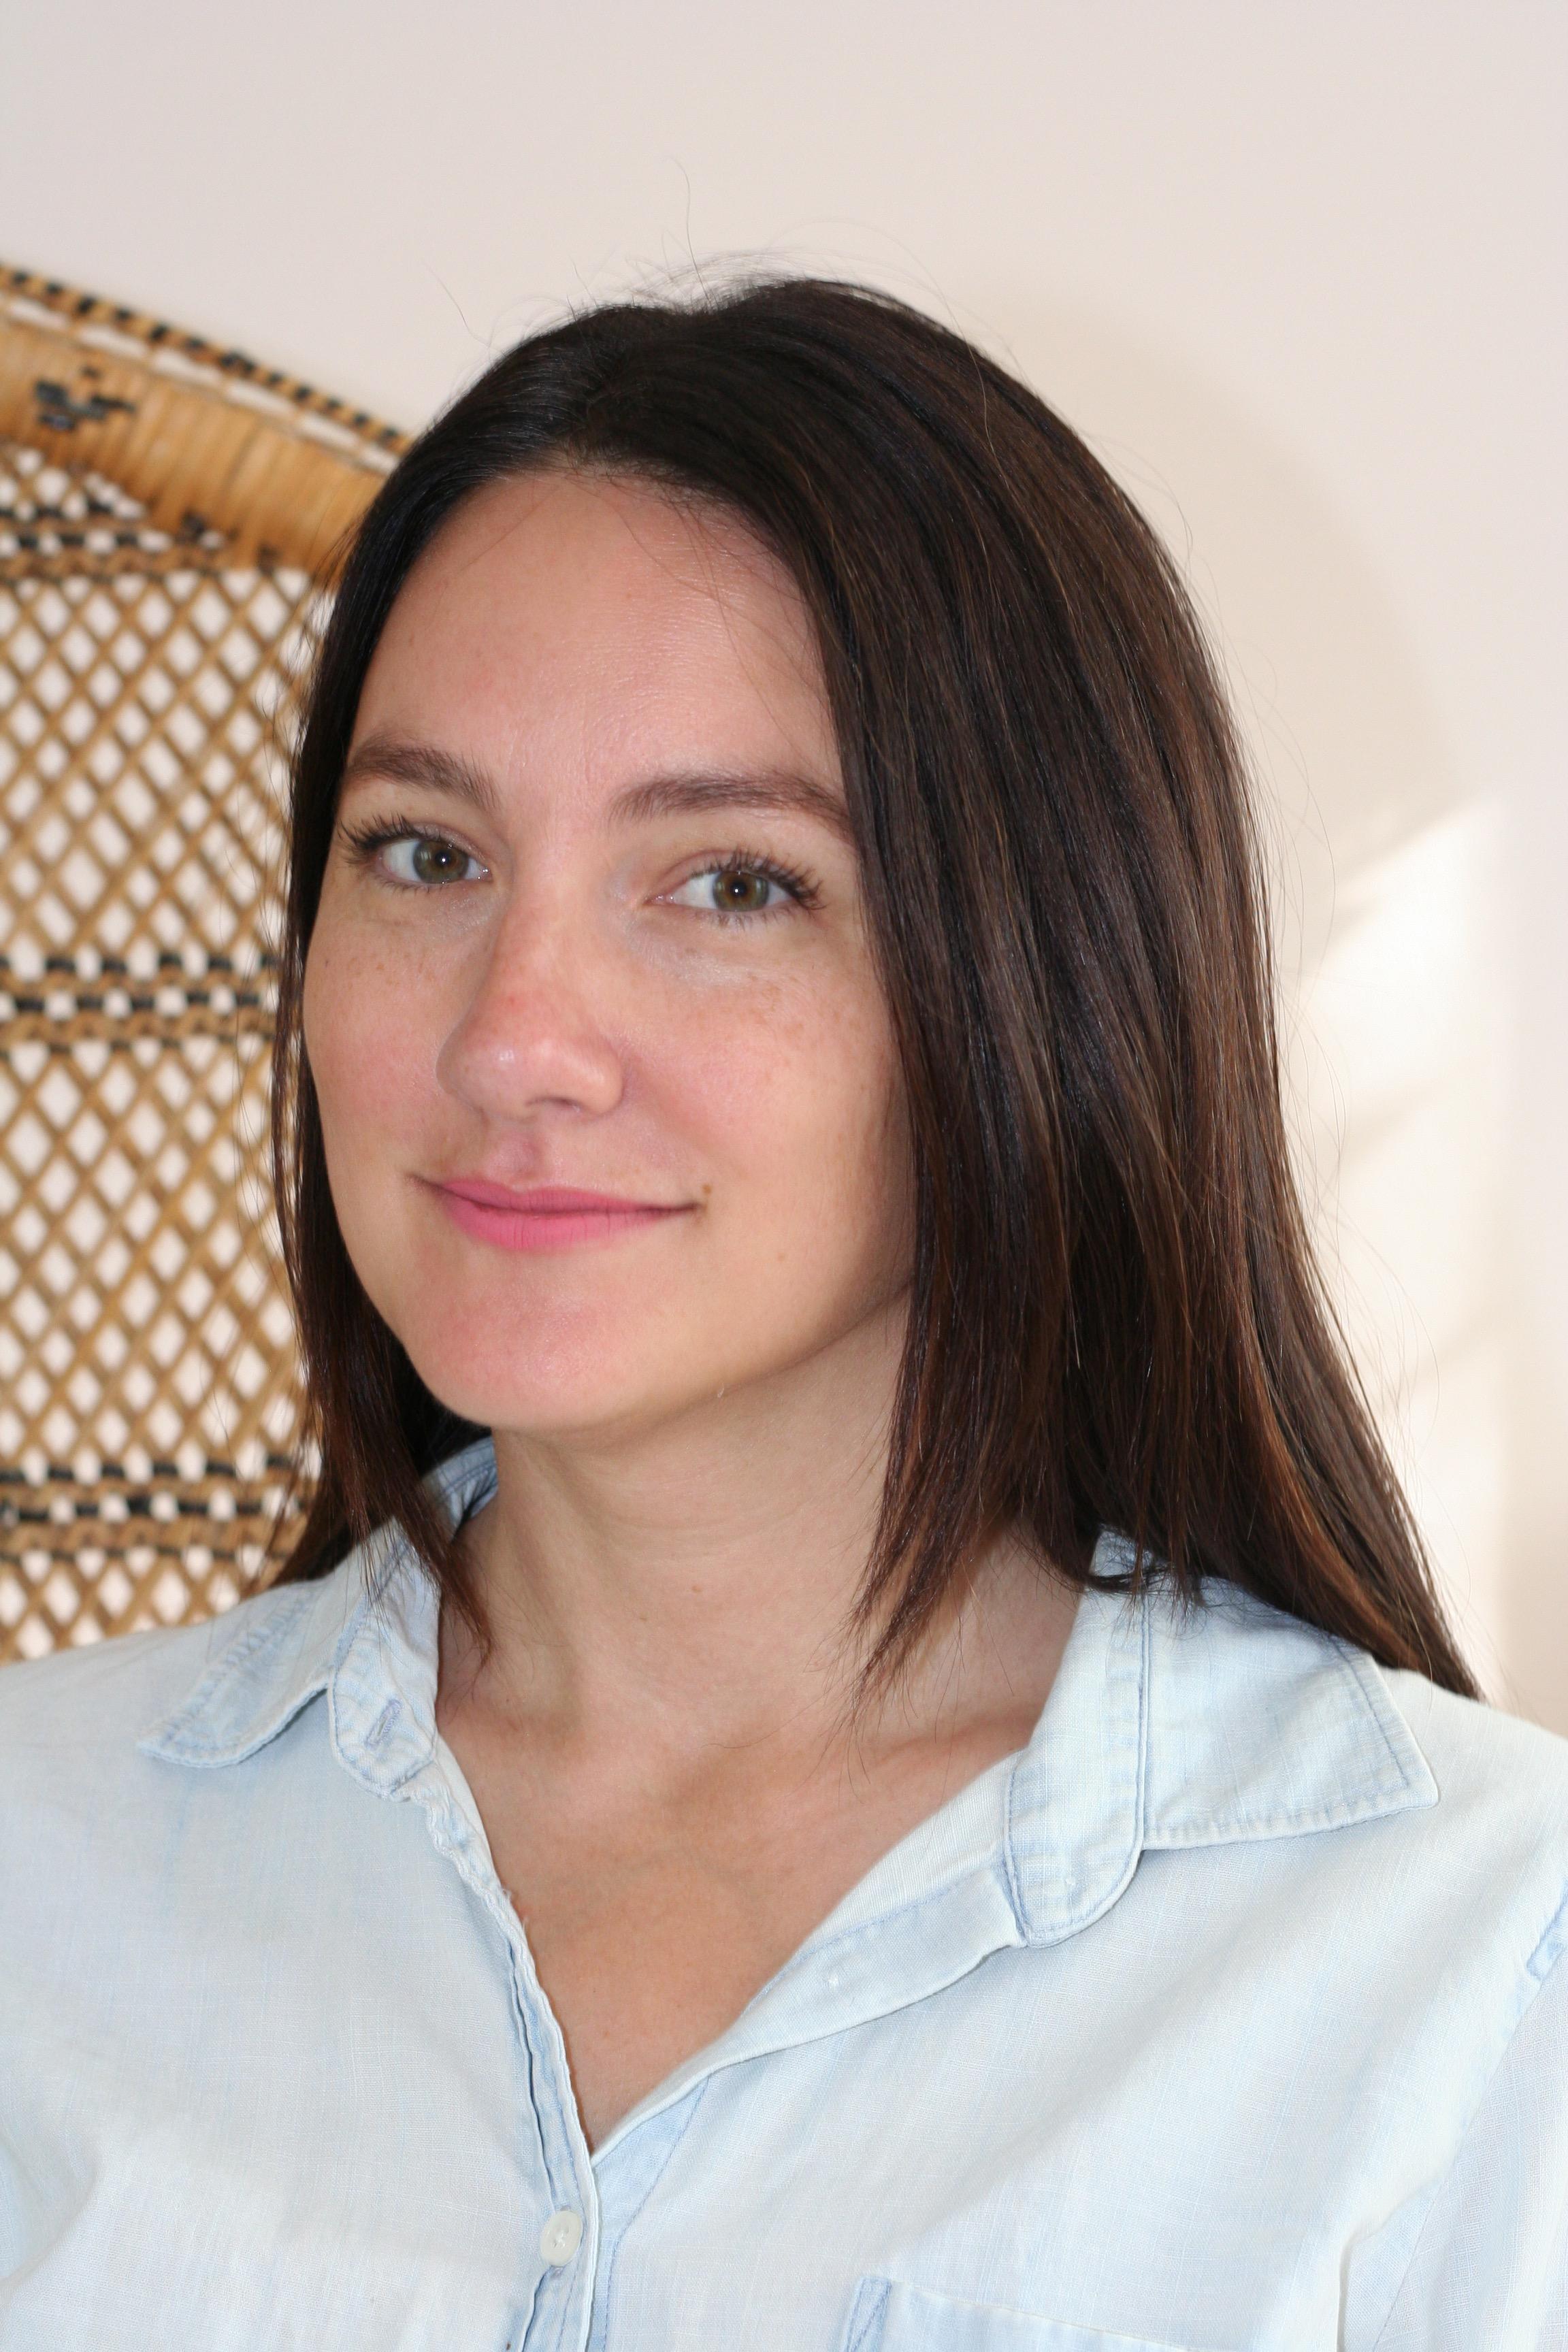 Erin Singer